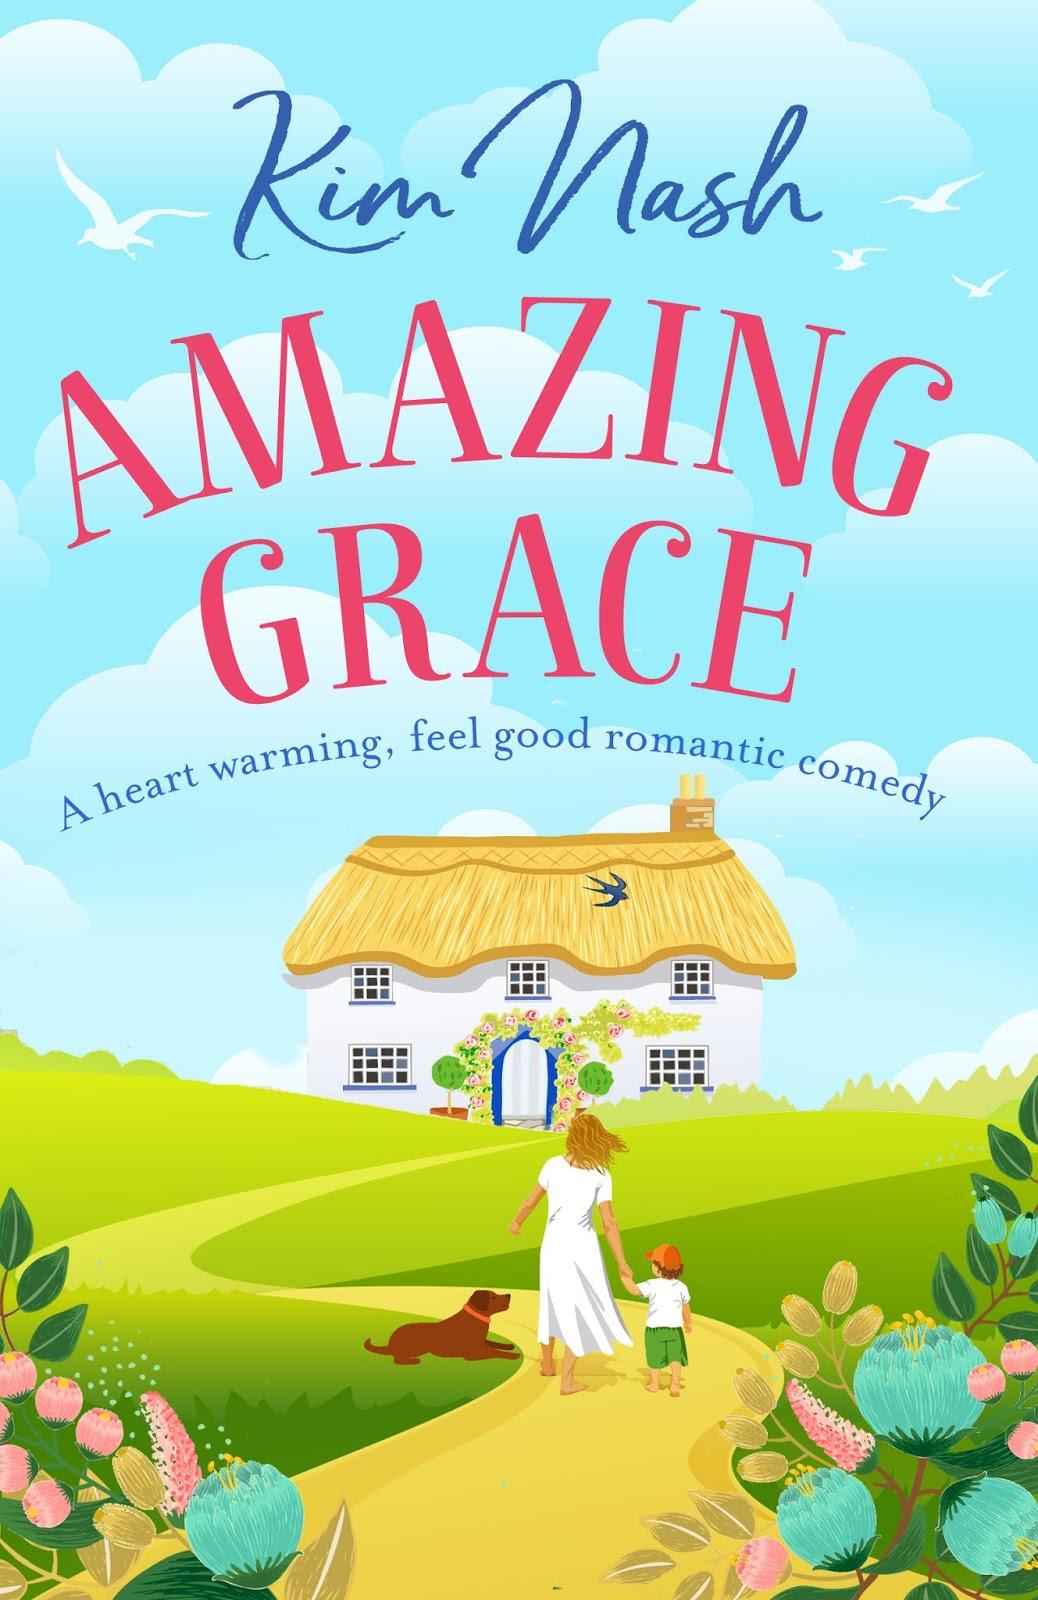 Amazing Grace by Kim Nash #BookReview #BlogTour